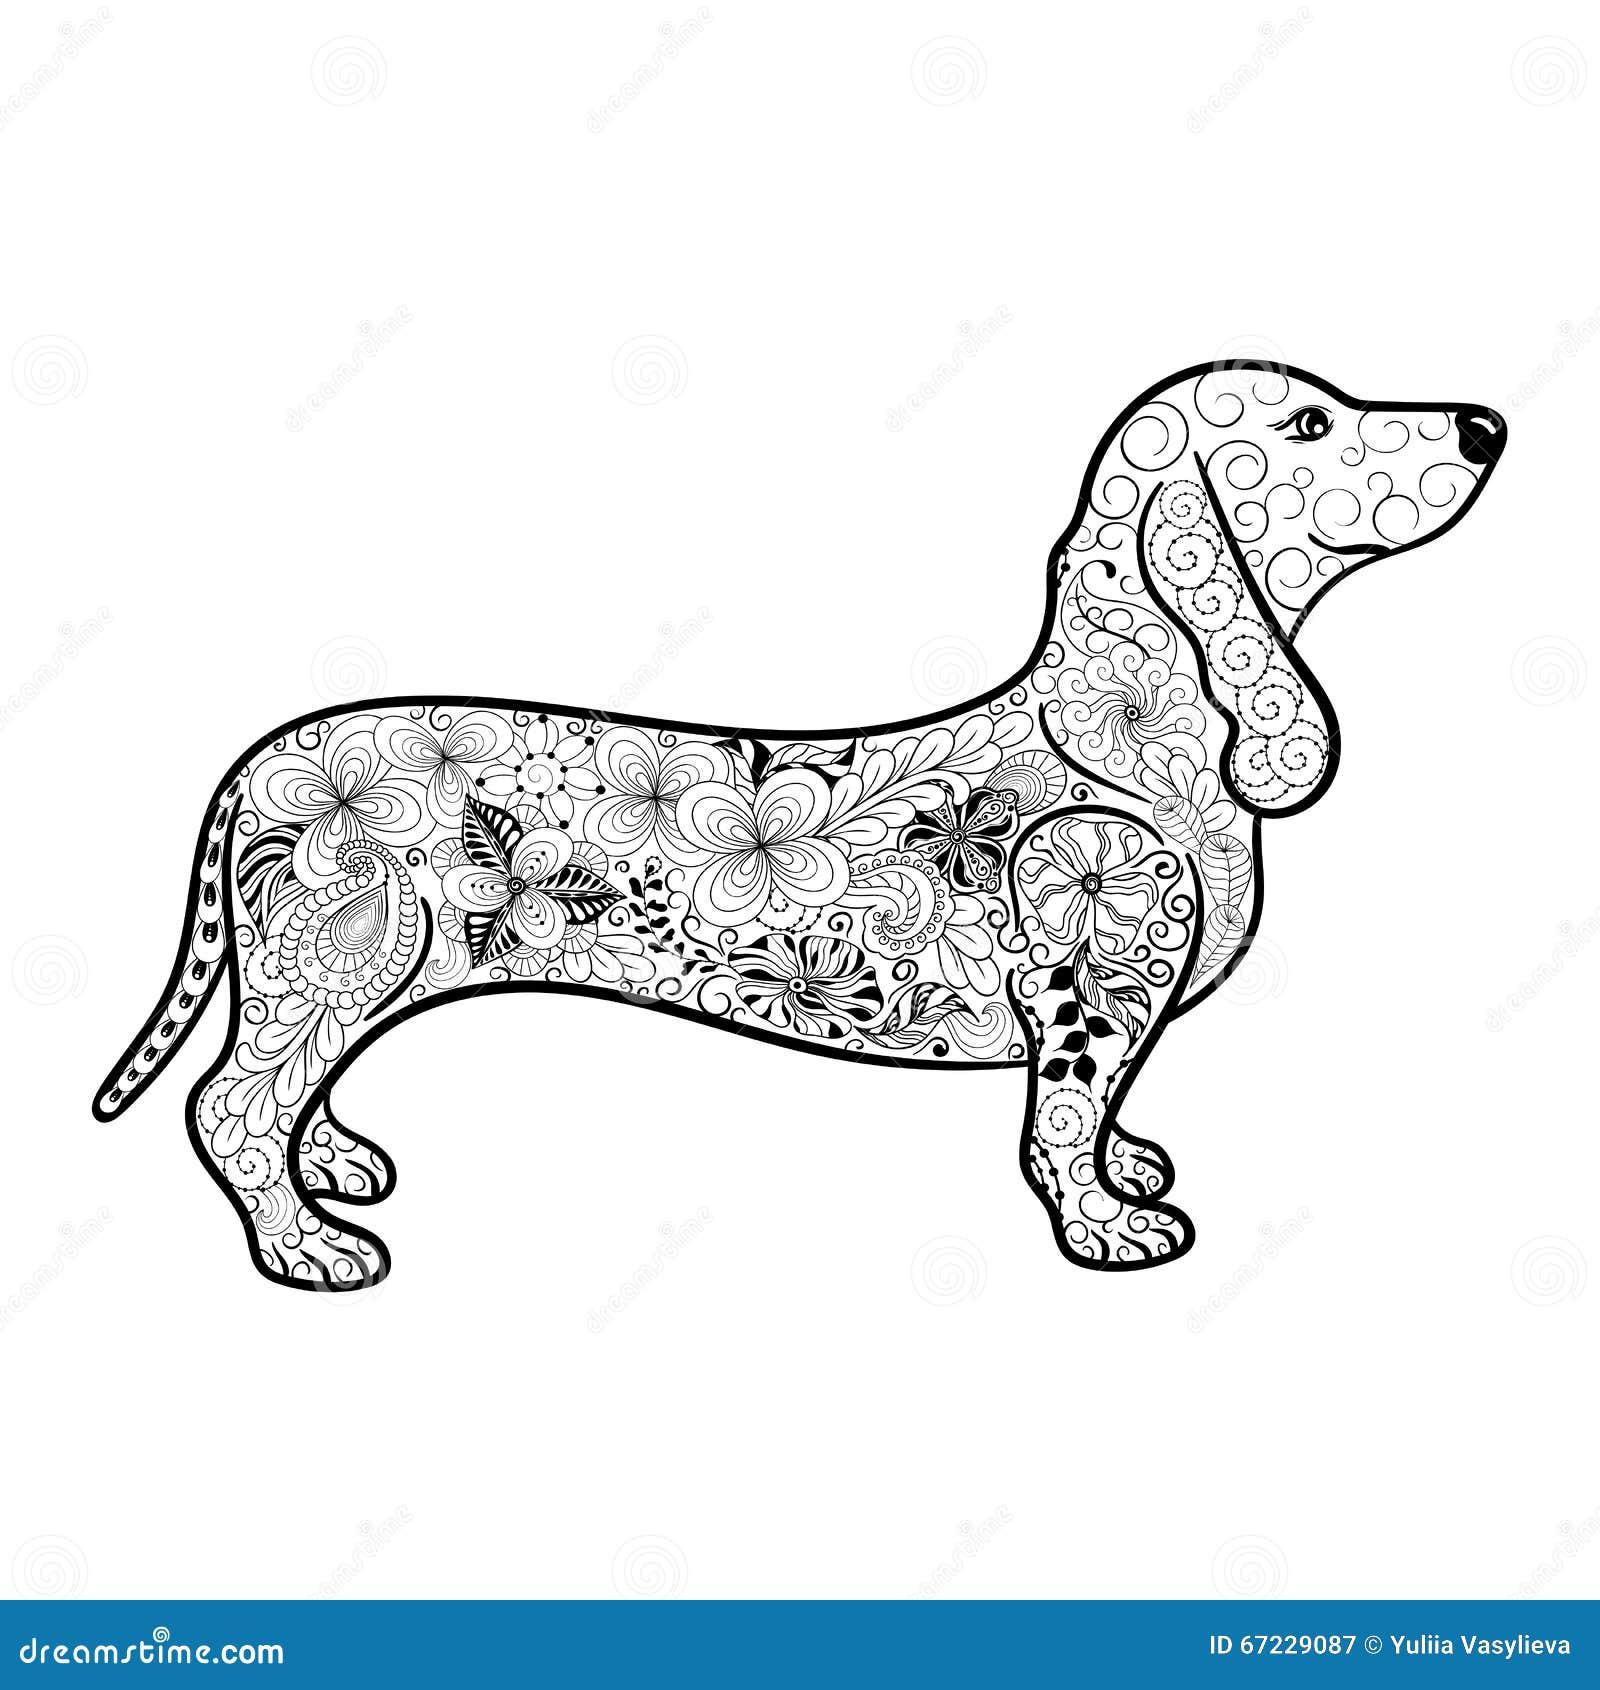 Dachshund doodle stock vector. Illustration of animal